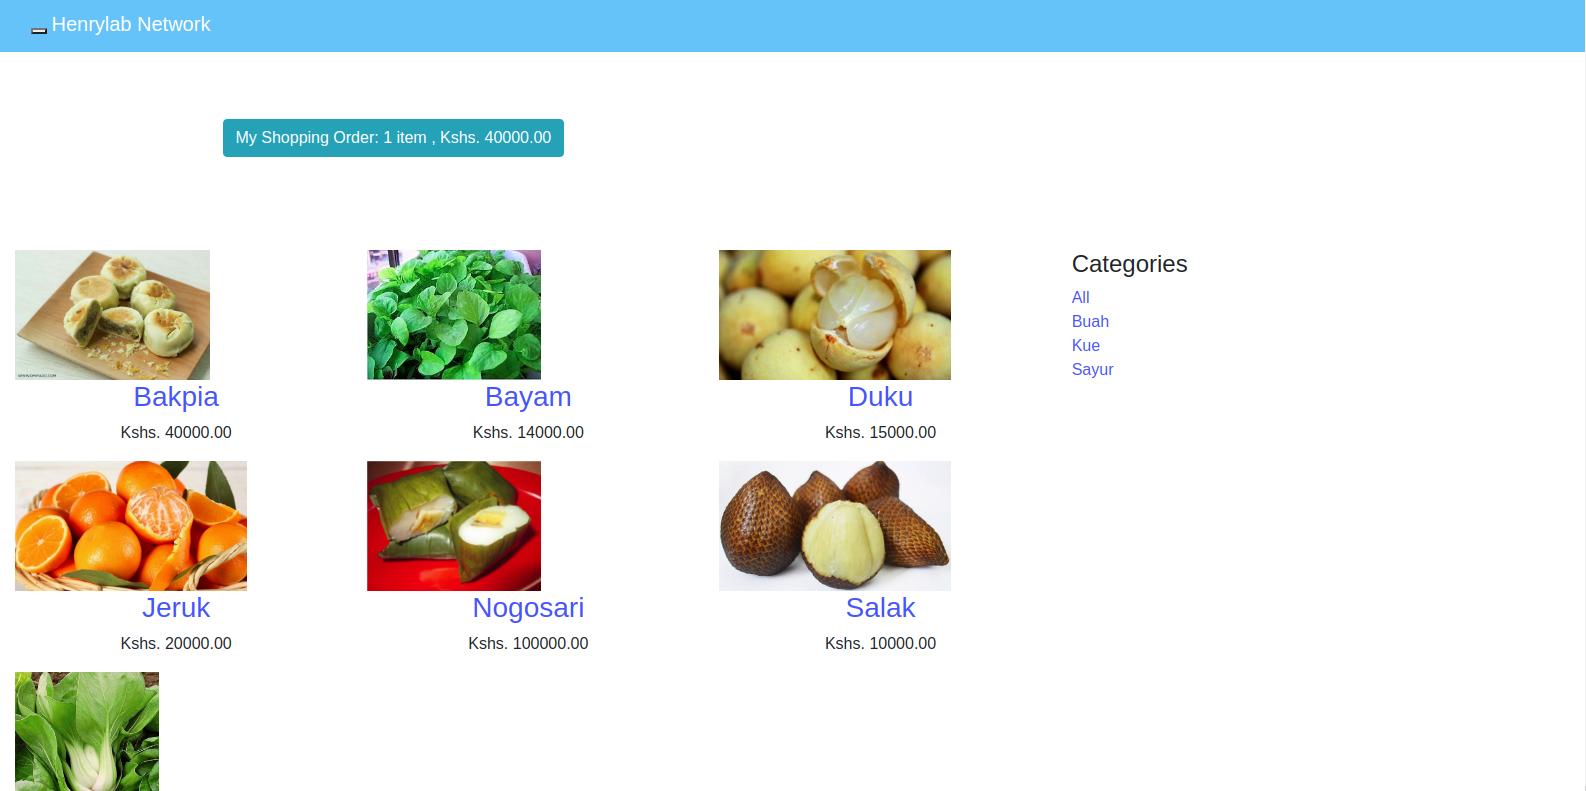 E-commerce site using Django Framework